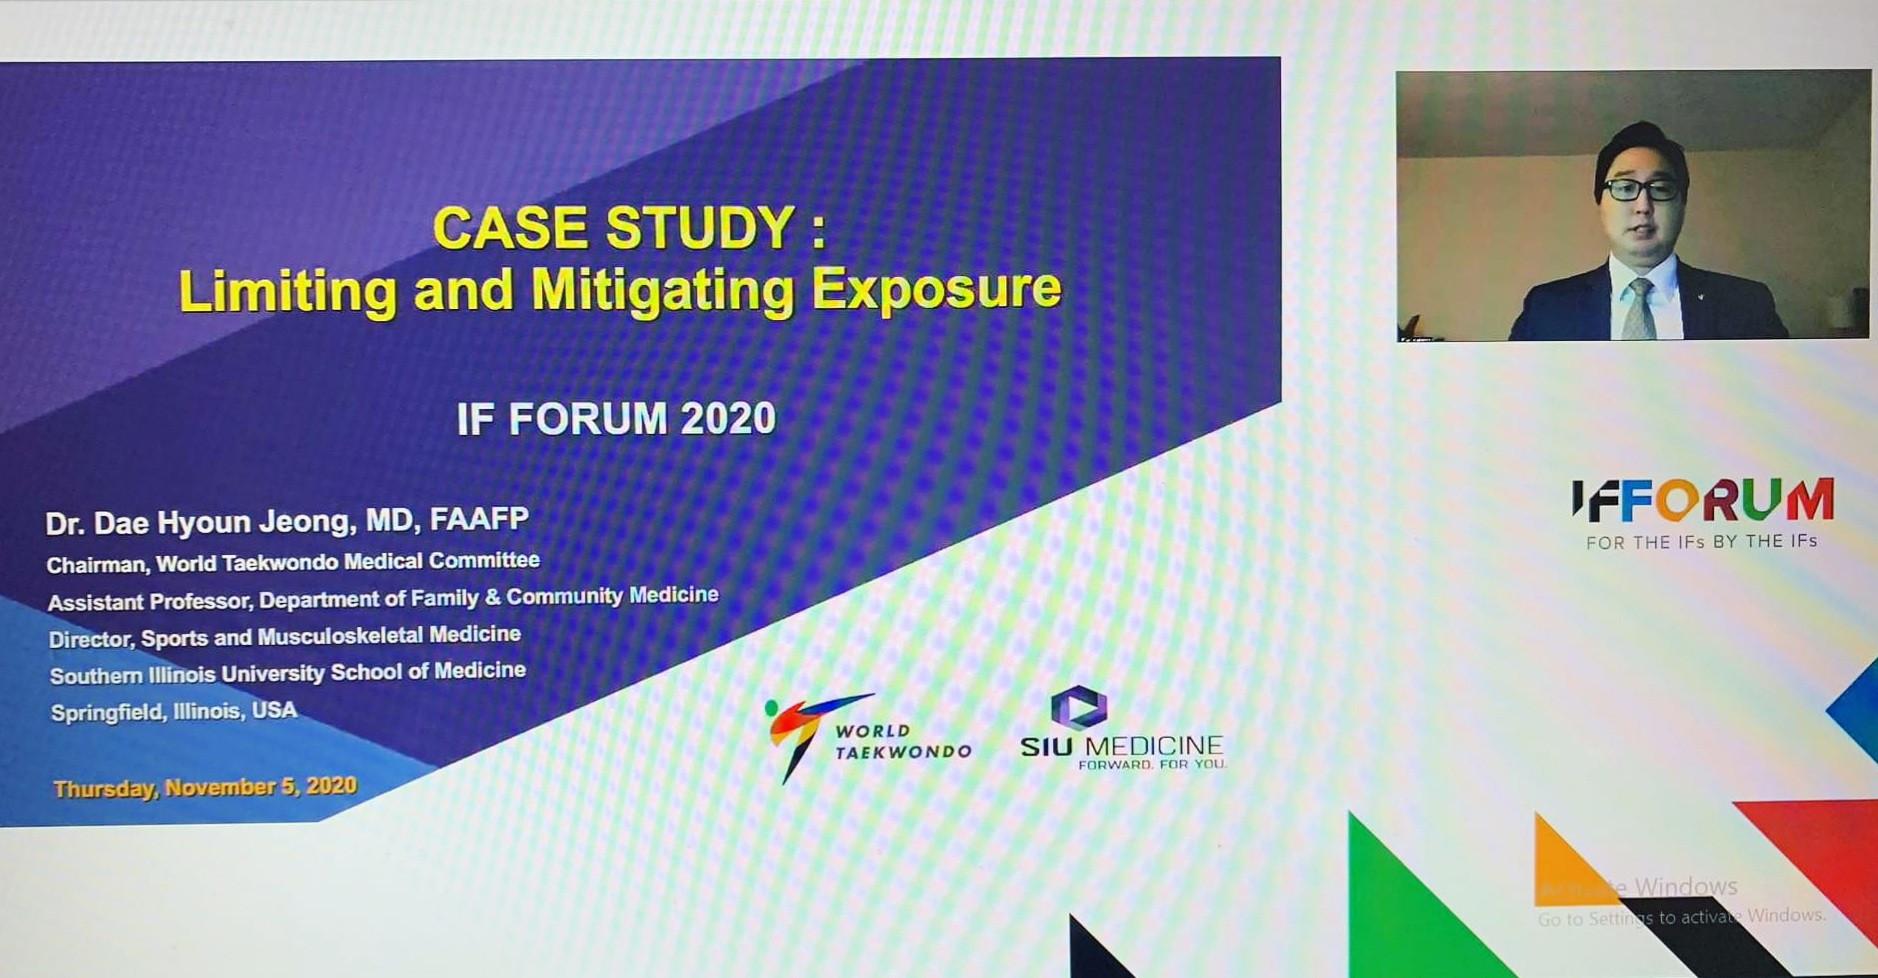 World Taekwondo medical chief presents COVID case study at IF Forum